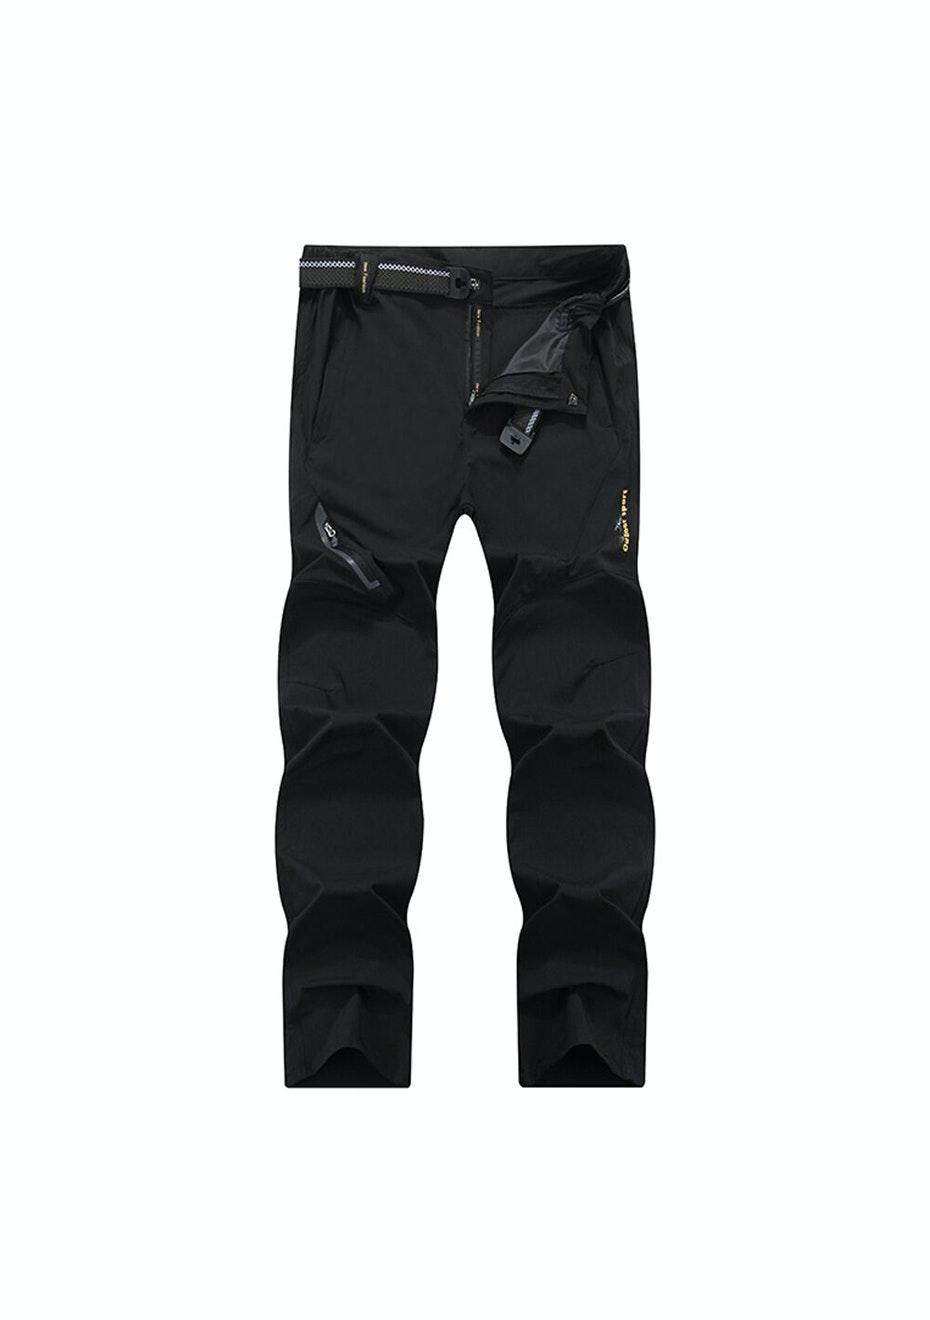 Women 2-in-1 WaterProof Pants - Black